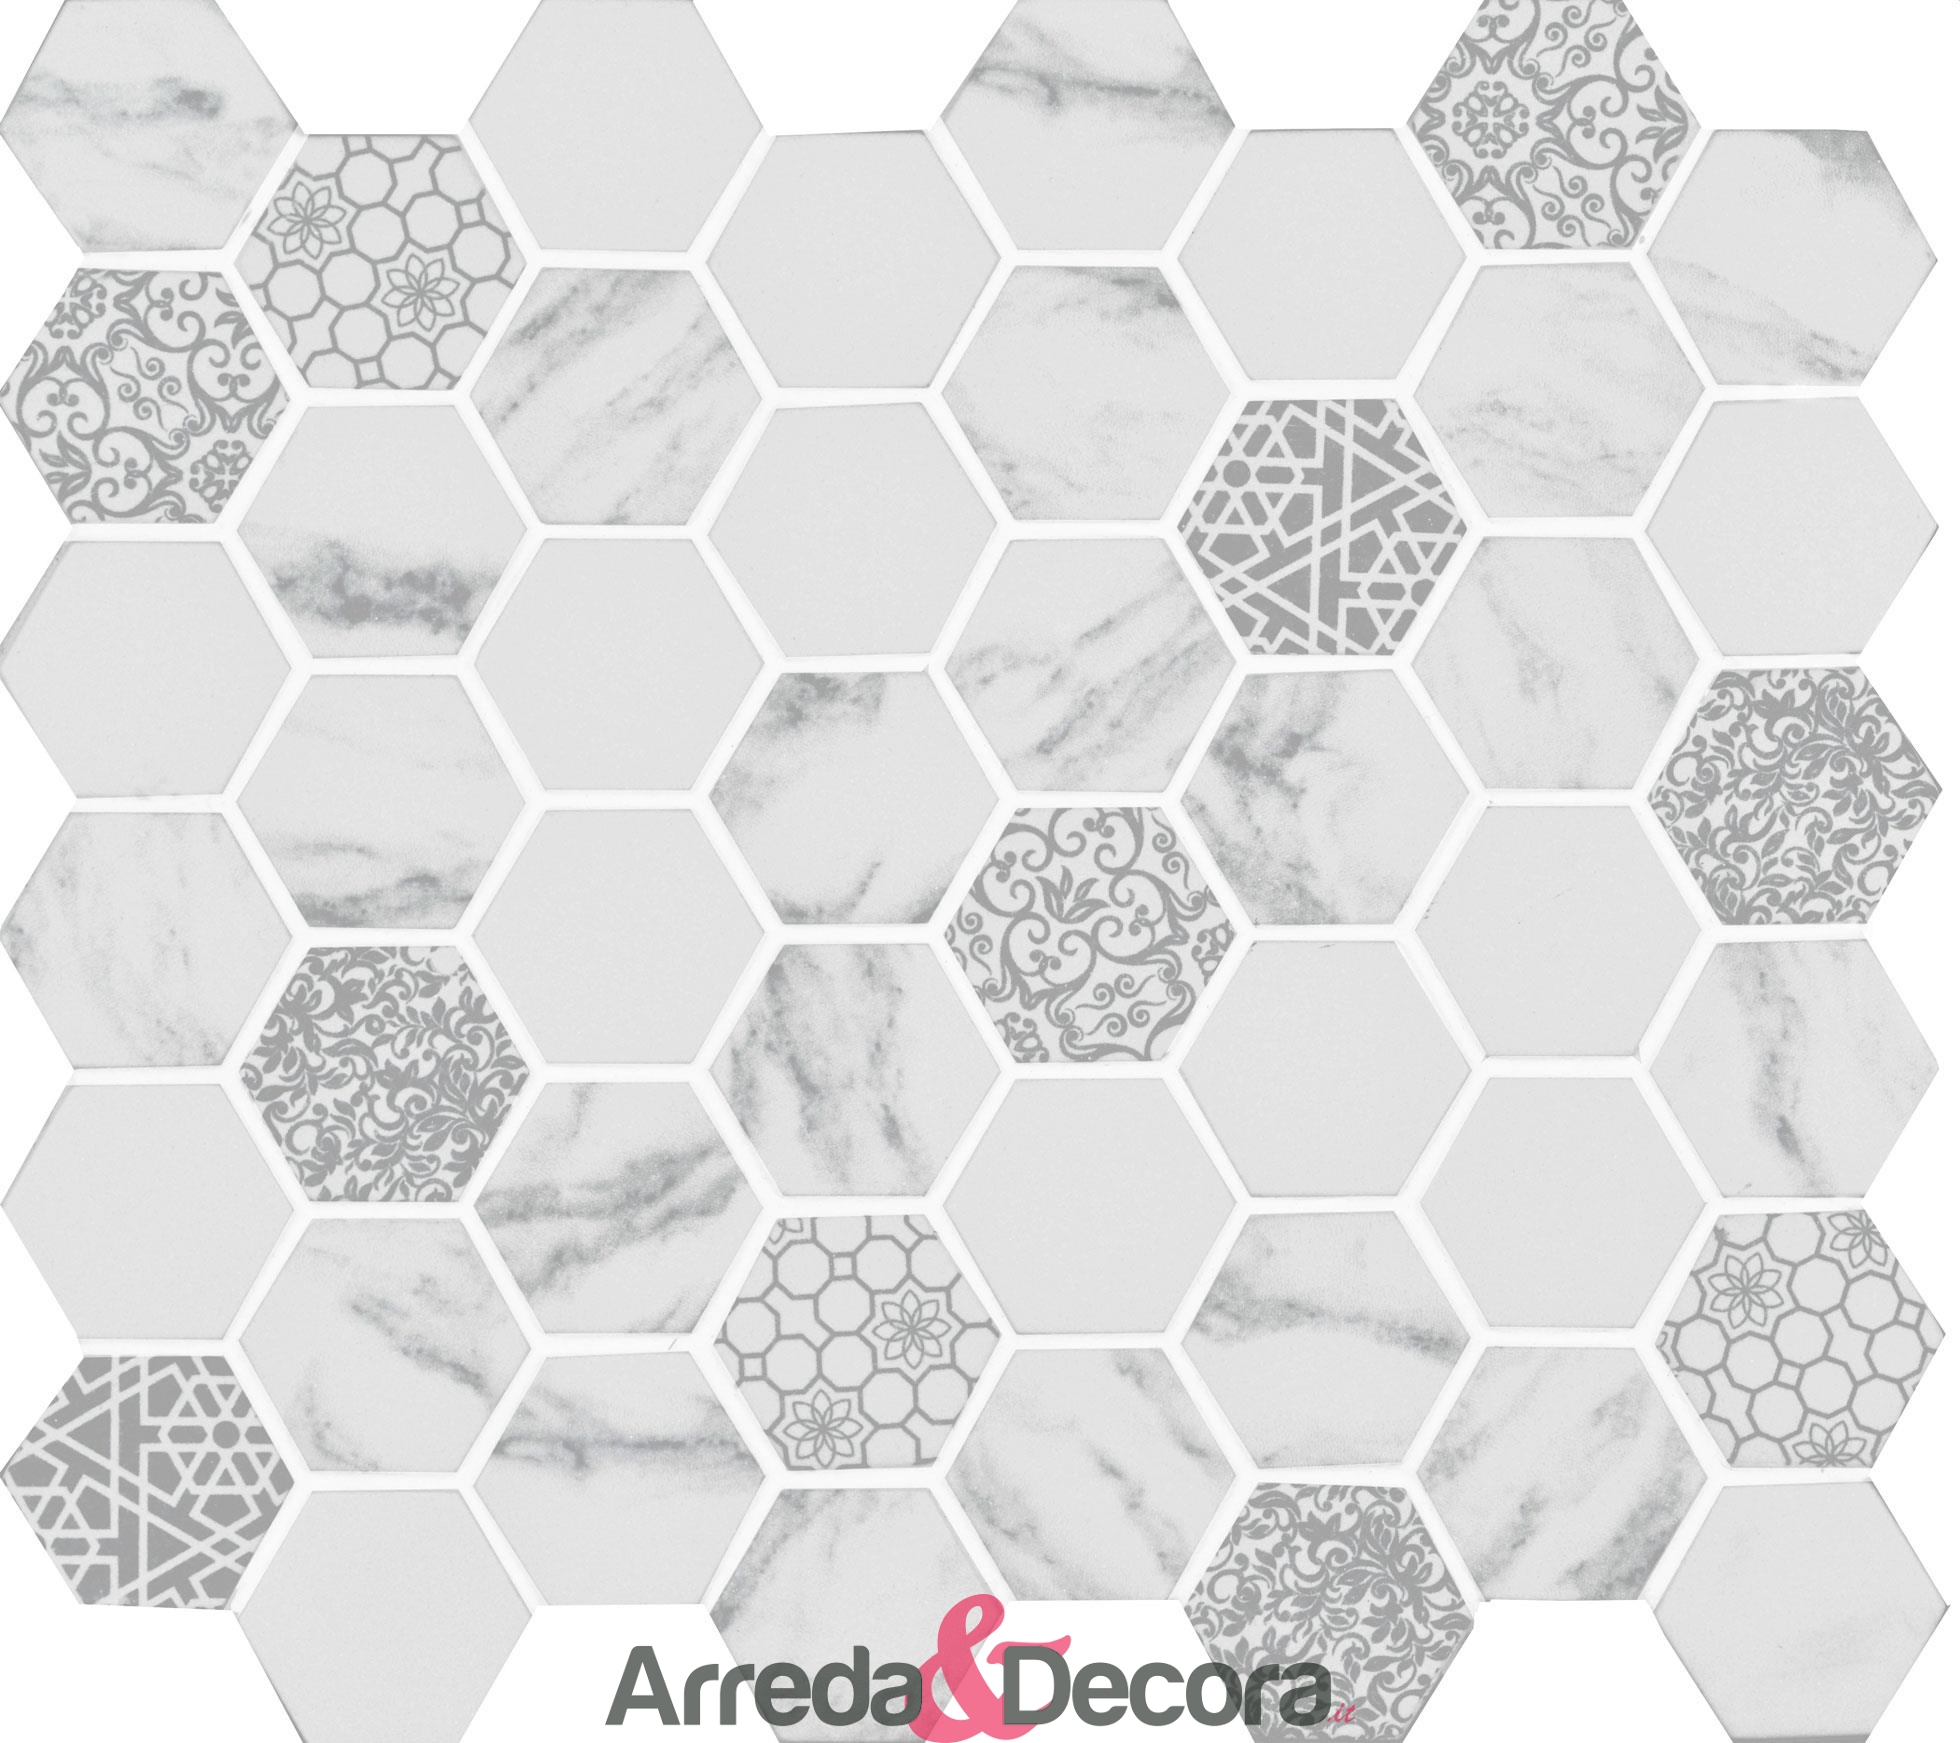 mosaico-esagonale-in-vetro-riciclato